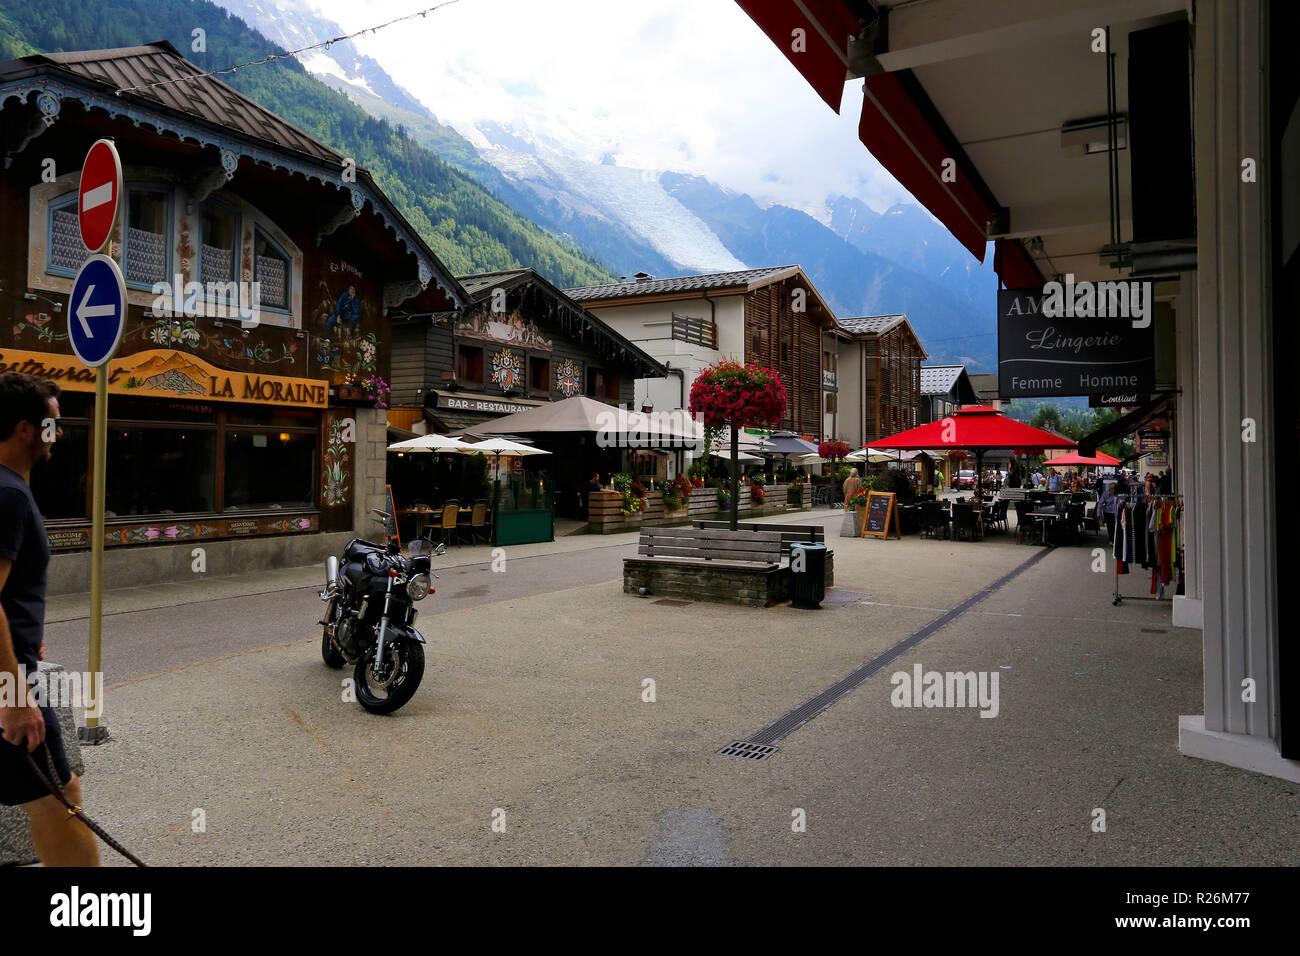 Chamonix Town Stock Photo